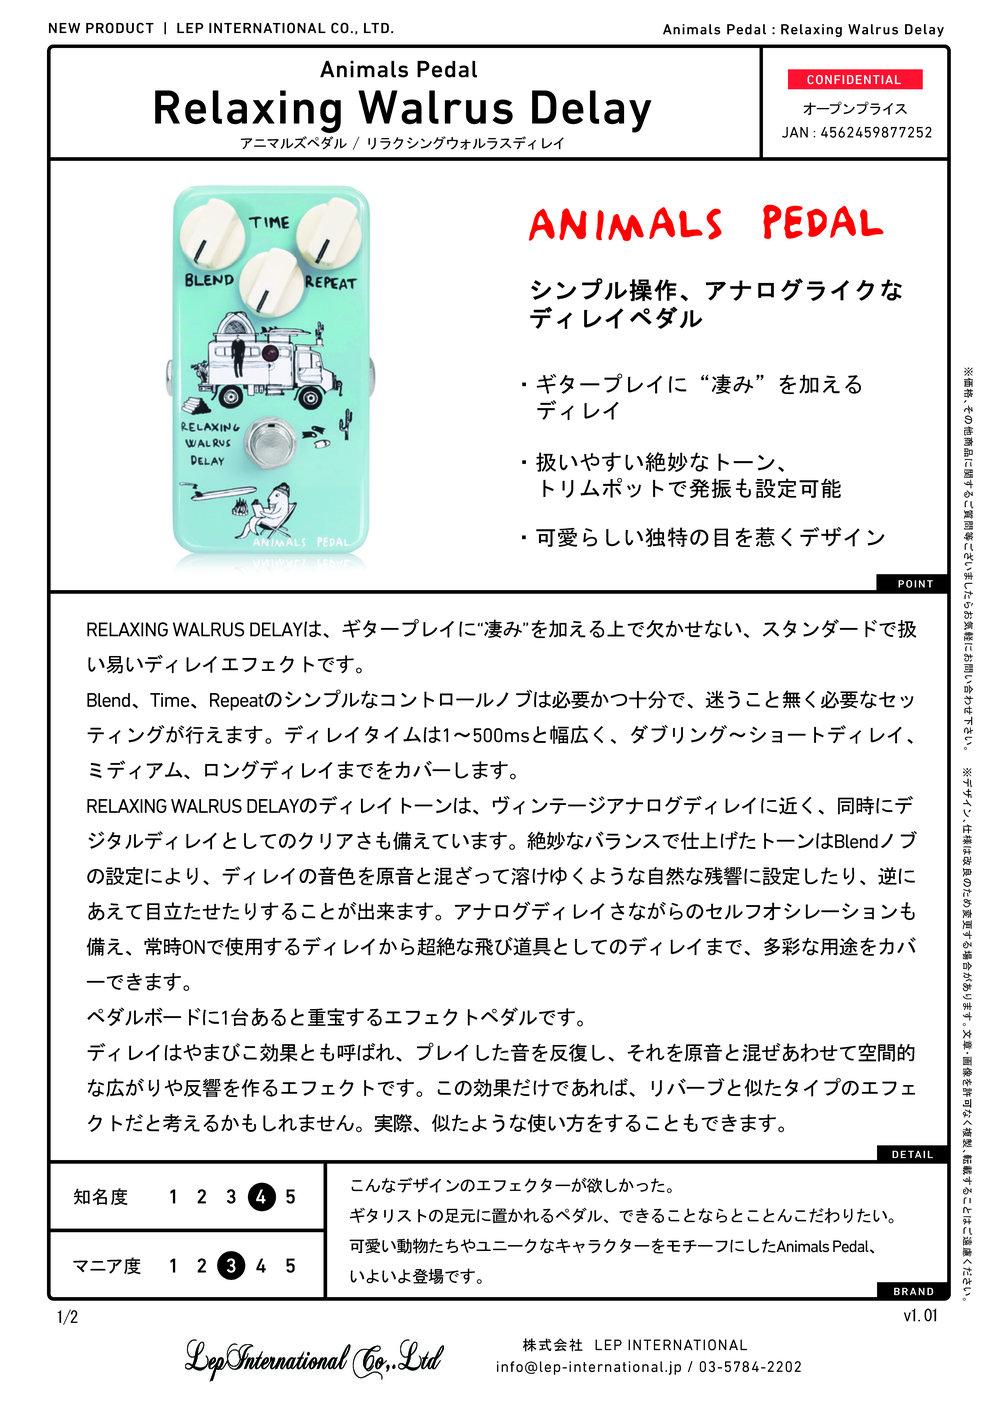 animalspedal relaxingwalrusdelay v1.01_ページ_1.jpg